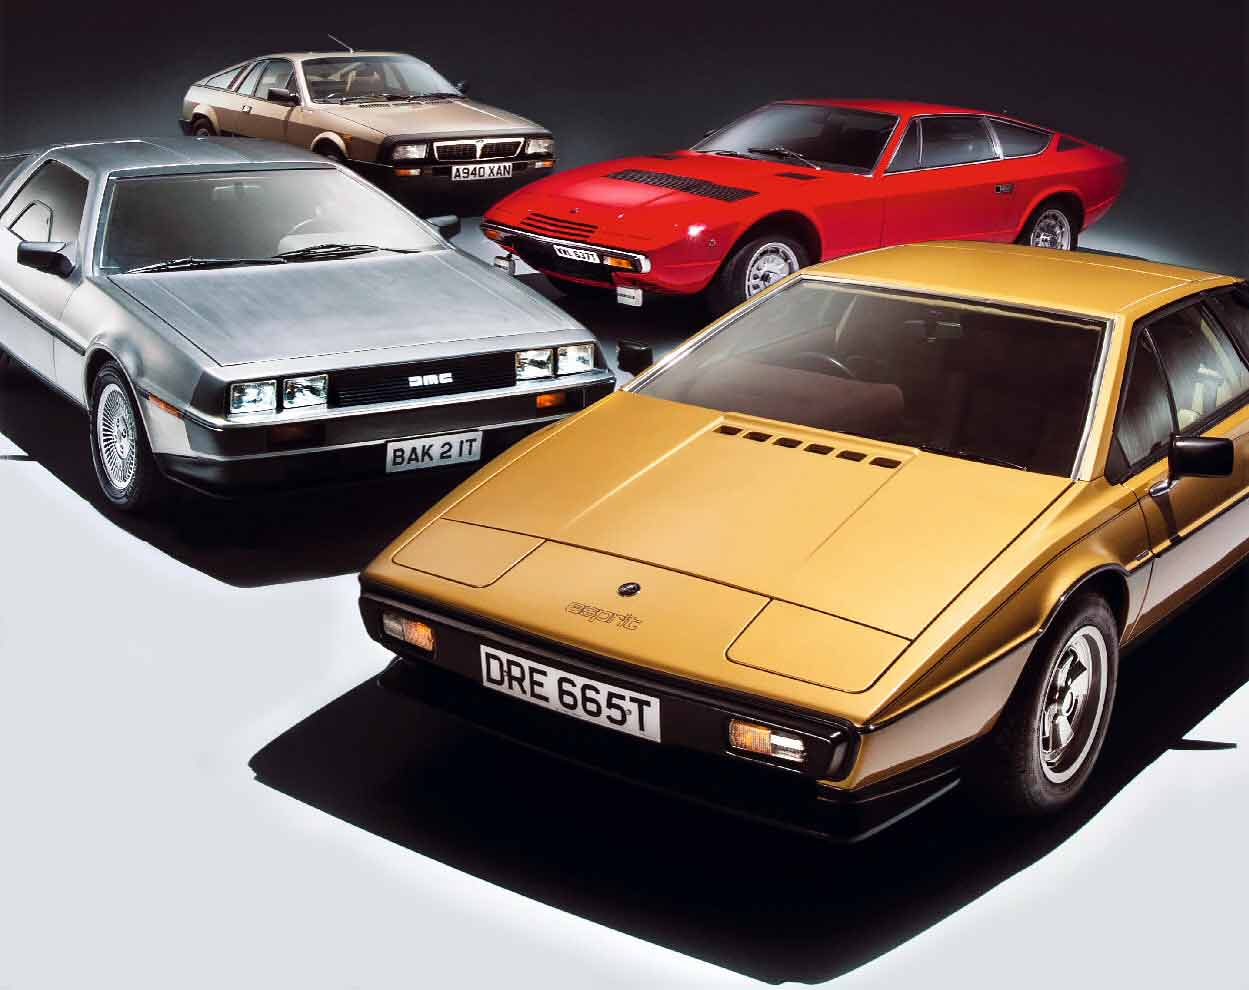 DeLorean DMC-12, Lancia Montecarlo, Maserati Khamsin and Lotus Esprit